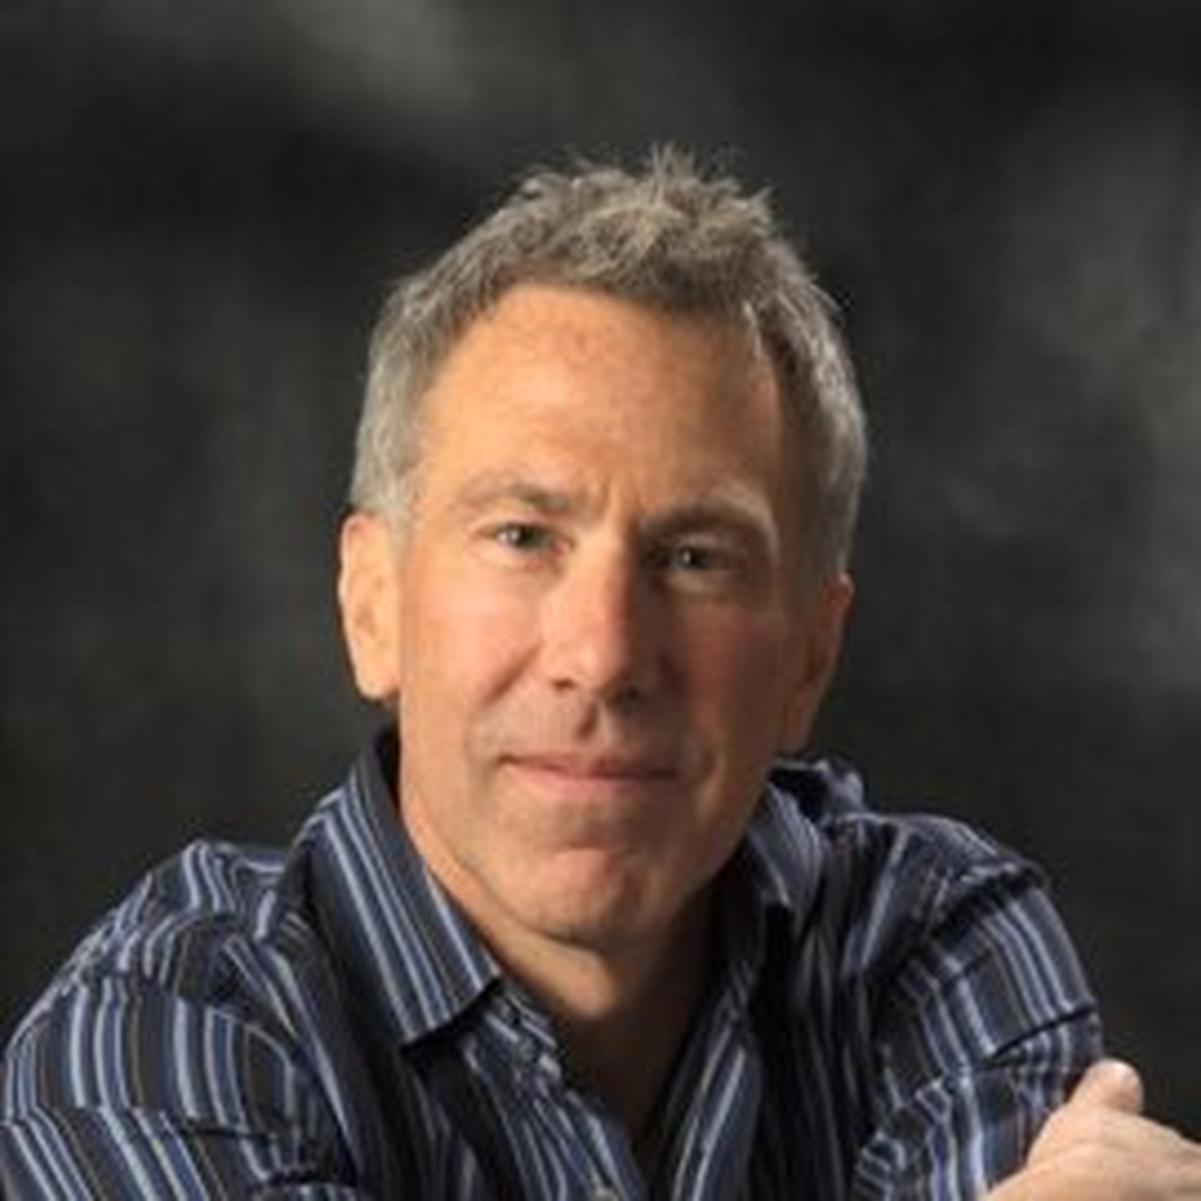 Steve Taubman